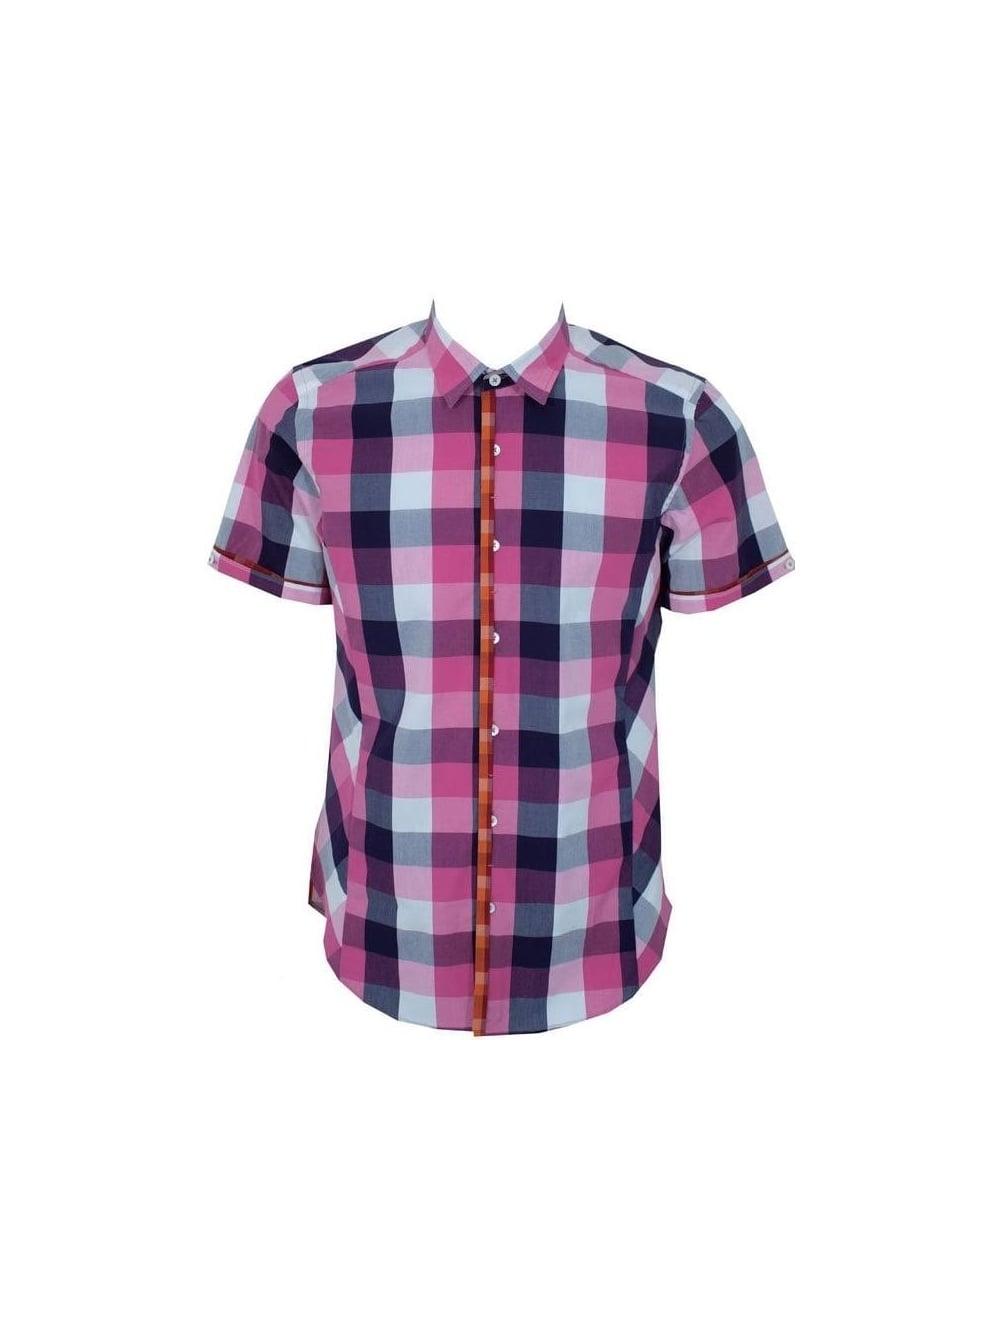 Ted Baker - Ted Baker Southga Check Shirt - Pink - Ted Baker Mens ...